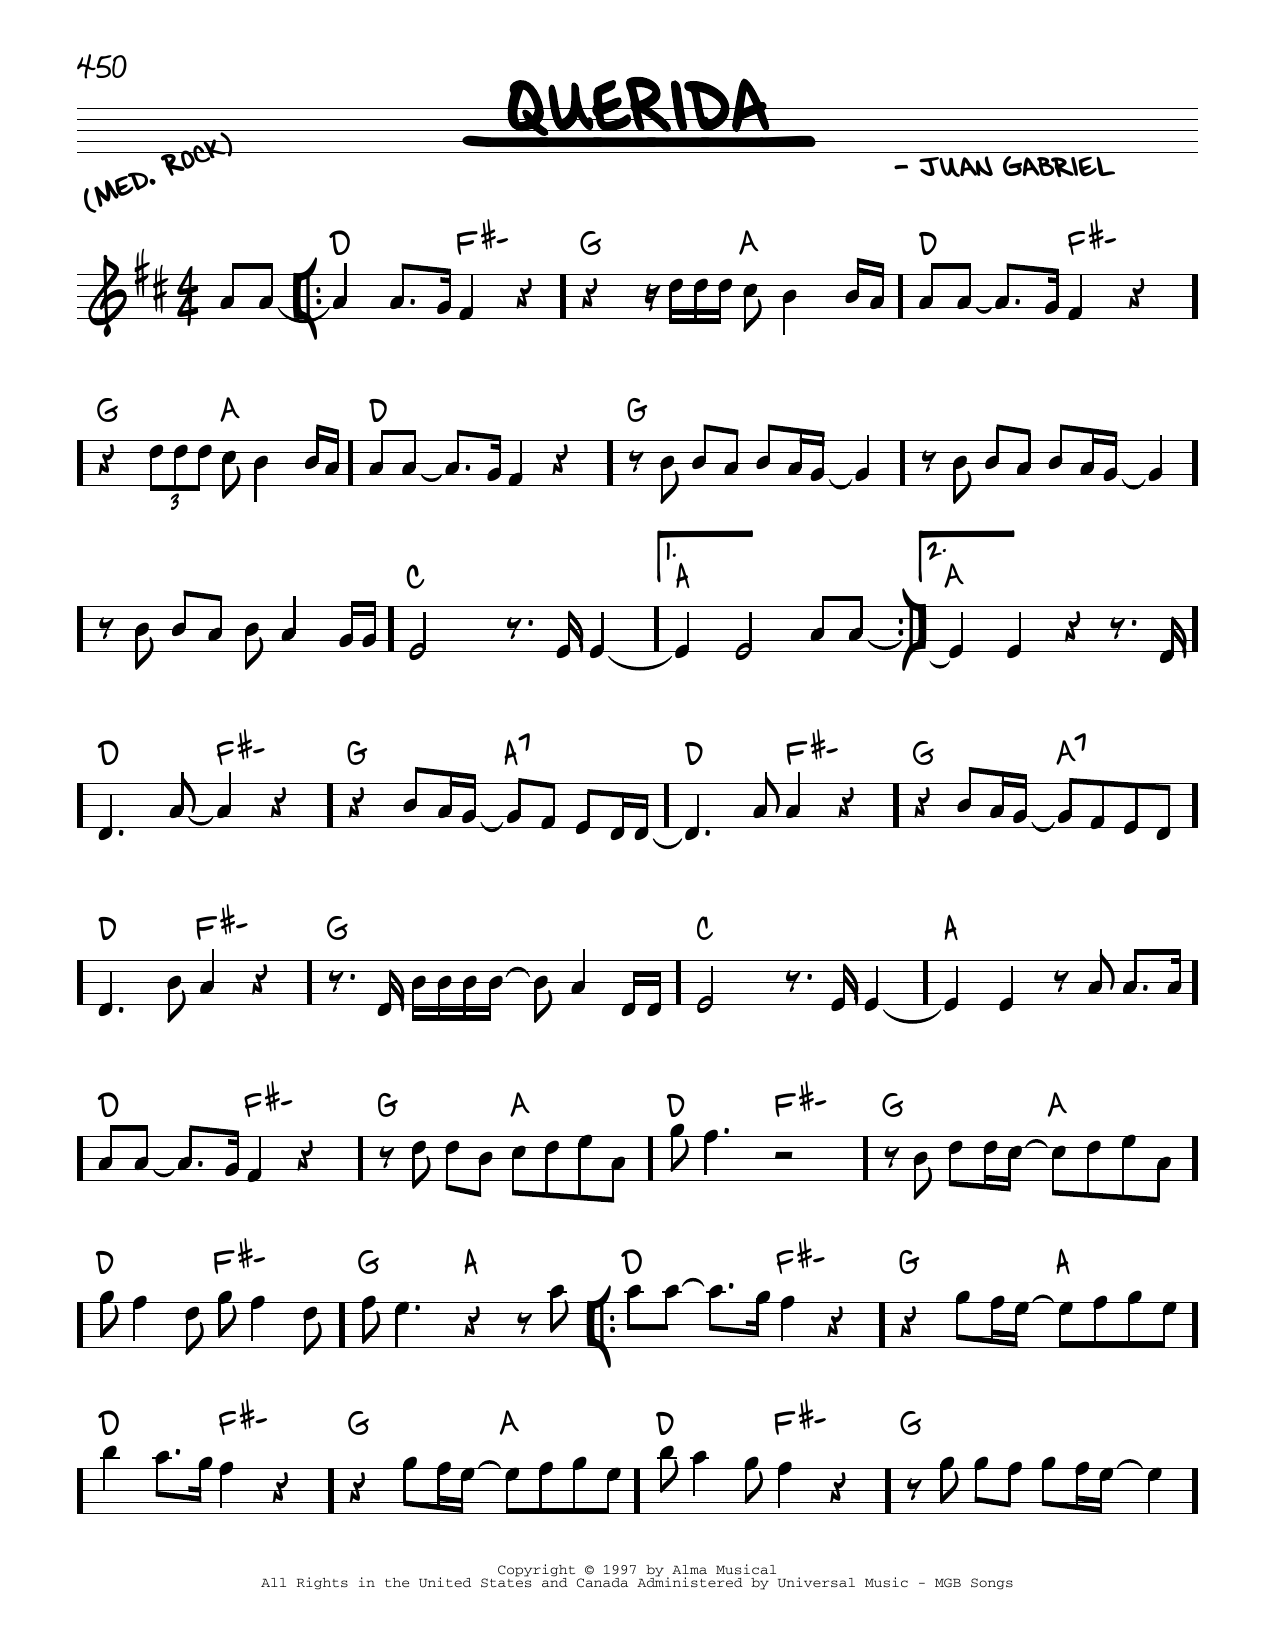 Juan Gabriel Querida sheet music notes and chords. Download Printable PDF.